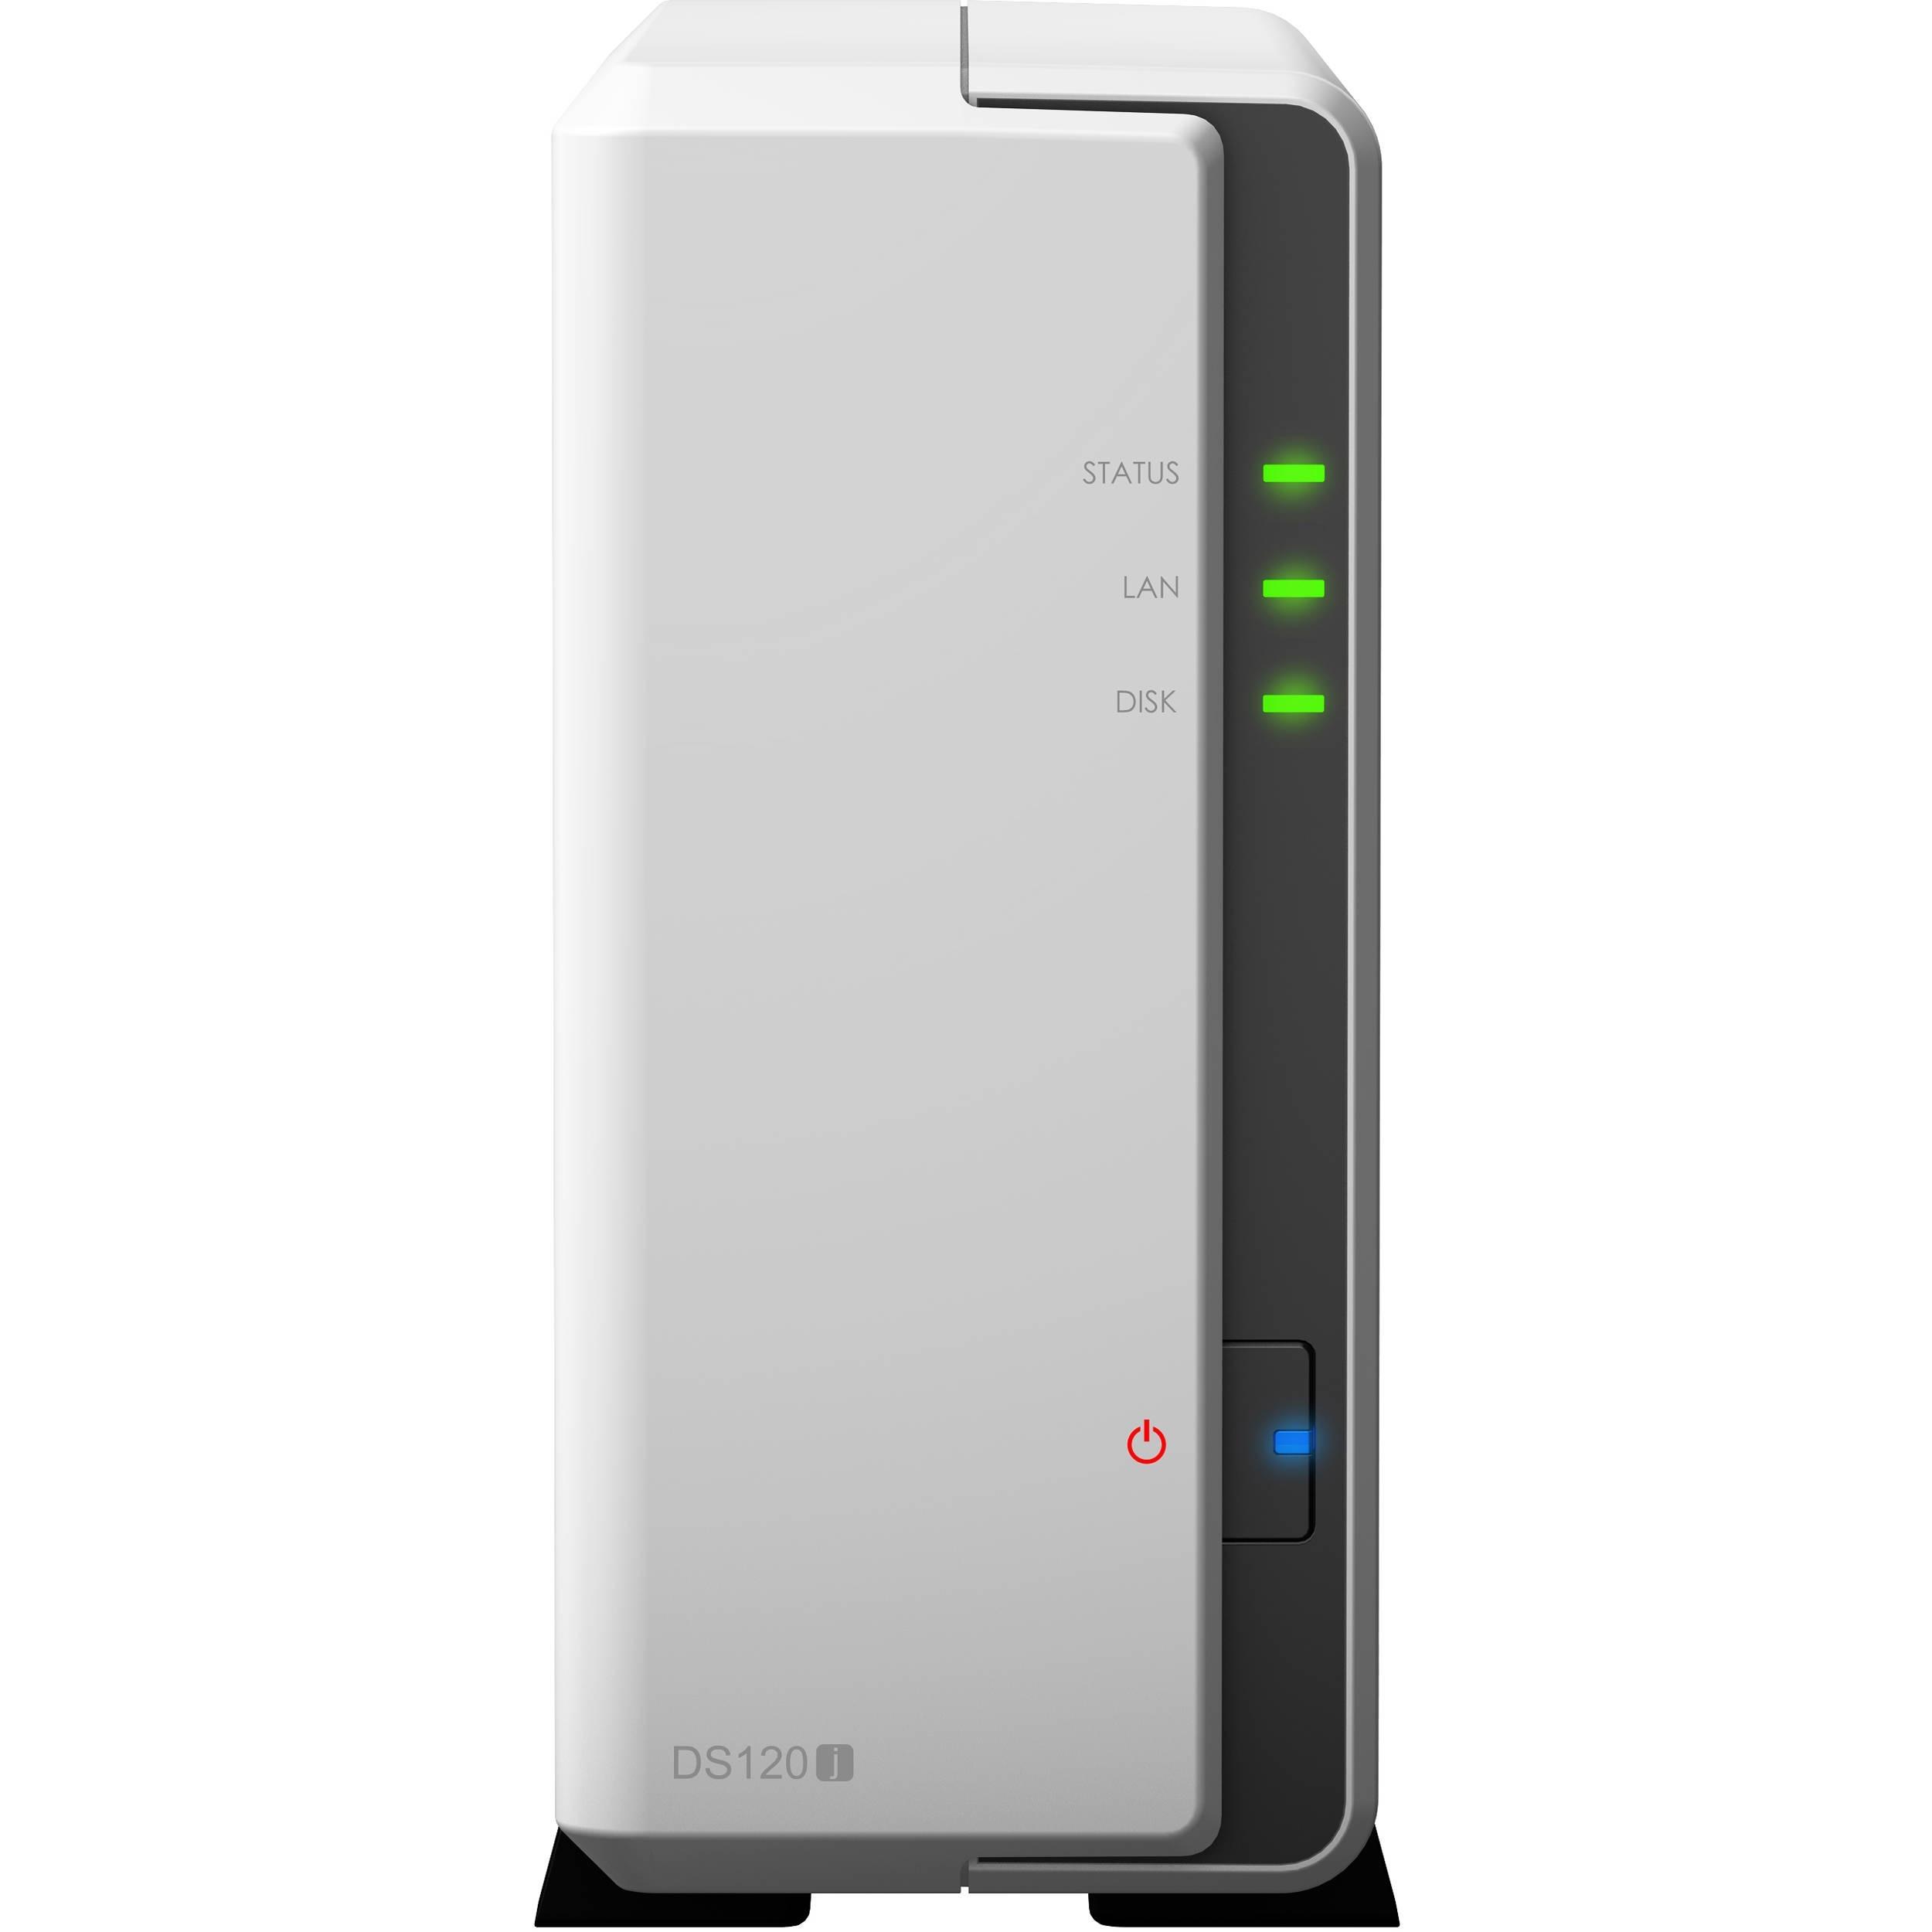 Synology DiskStation 3TB DS120j 1-Bay NAS Enclosure